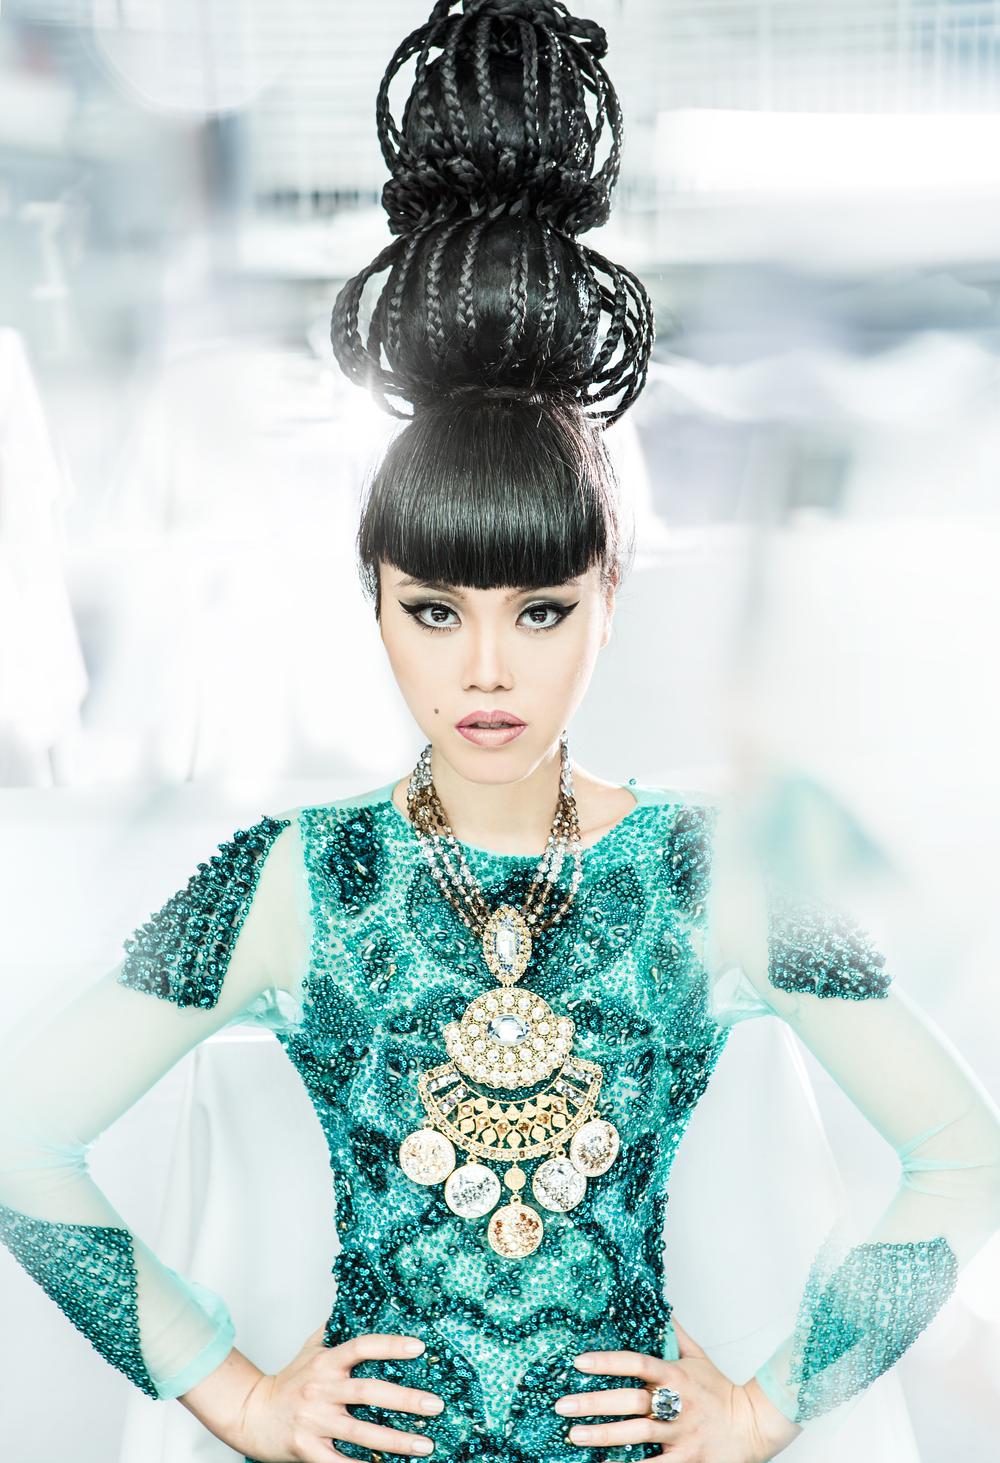 NYC, fashion by Syeda Amera & Sonia Heilbron